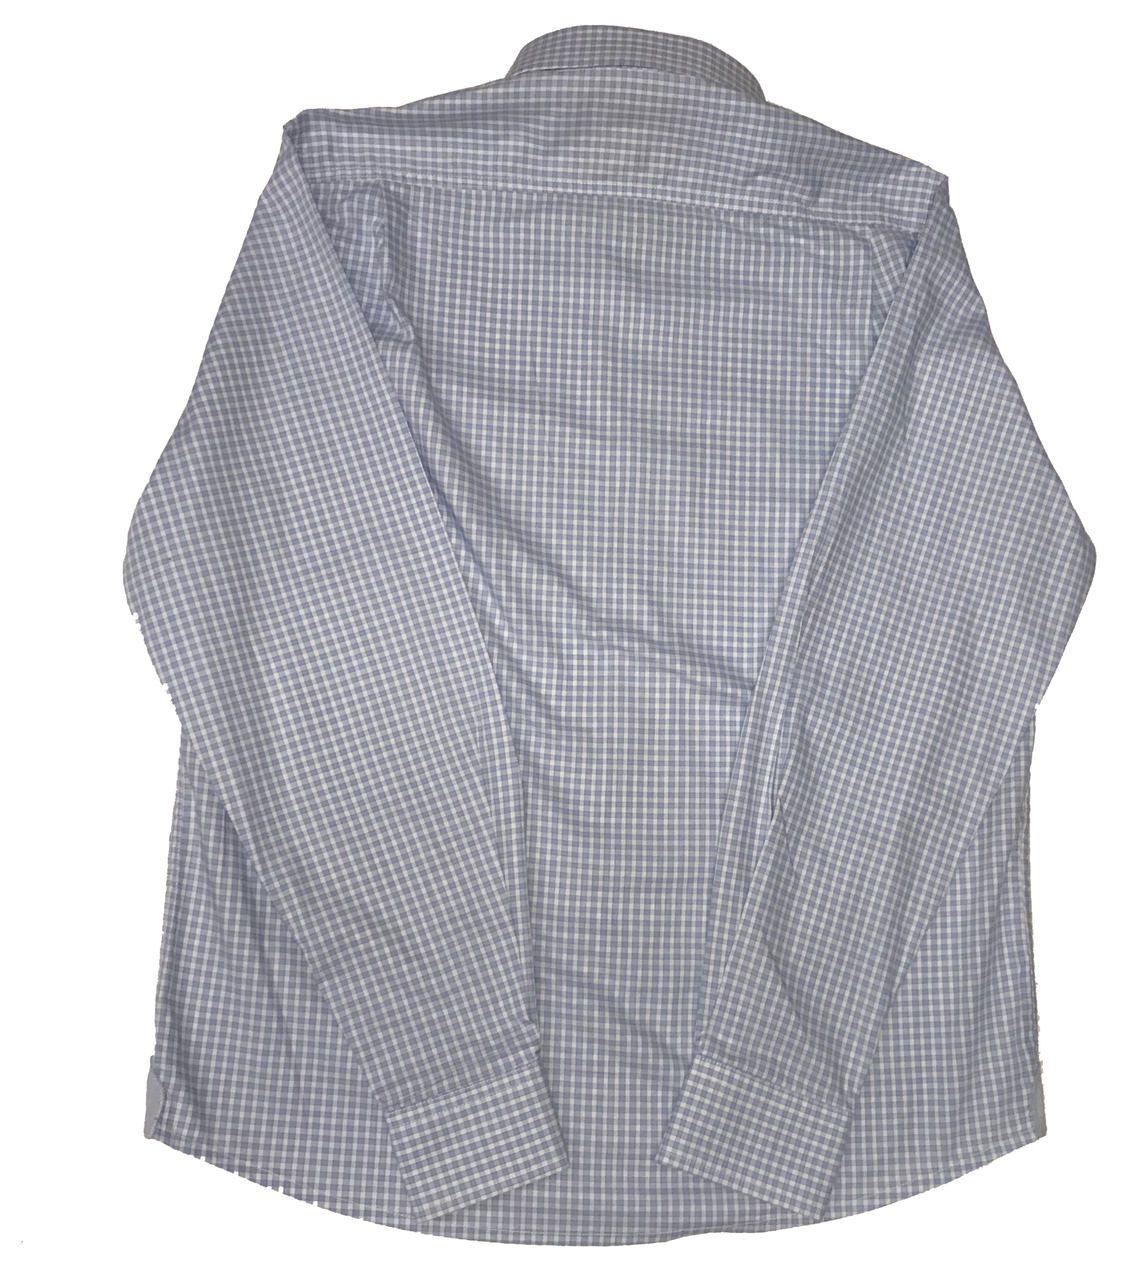 Camisa Social Masculina Xadrez  - Boutique Mangalarga